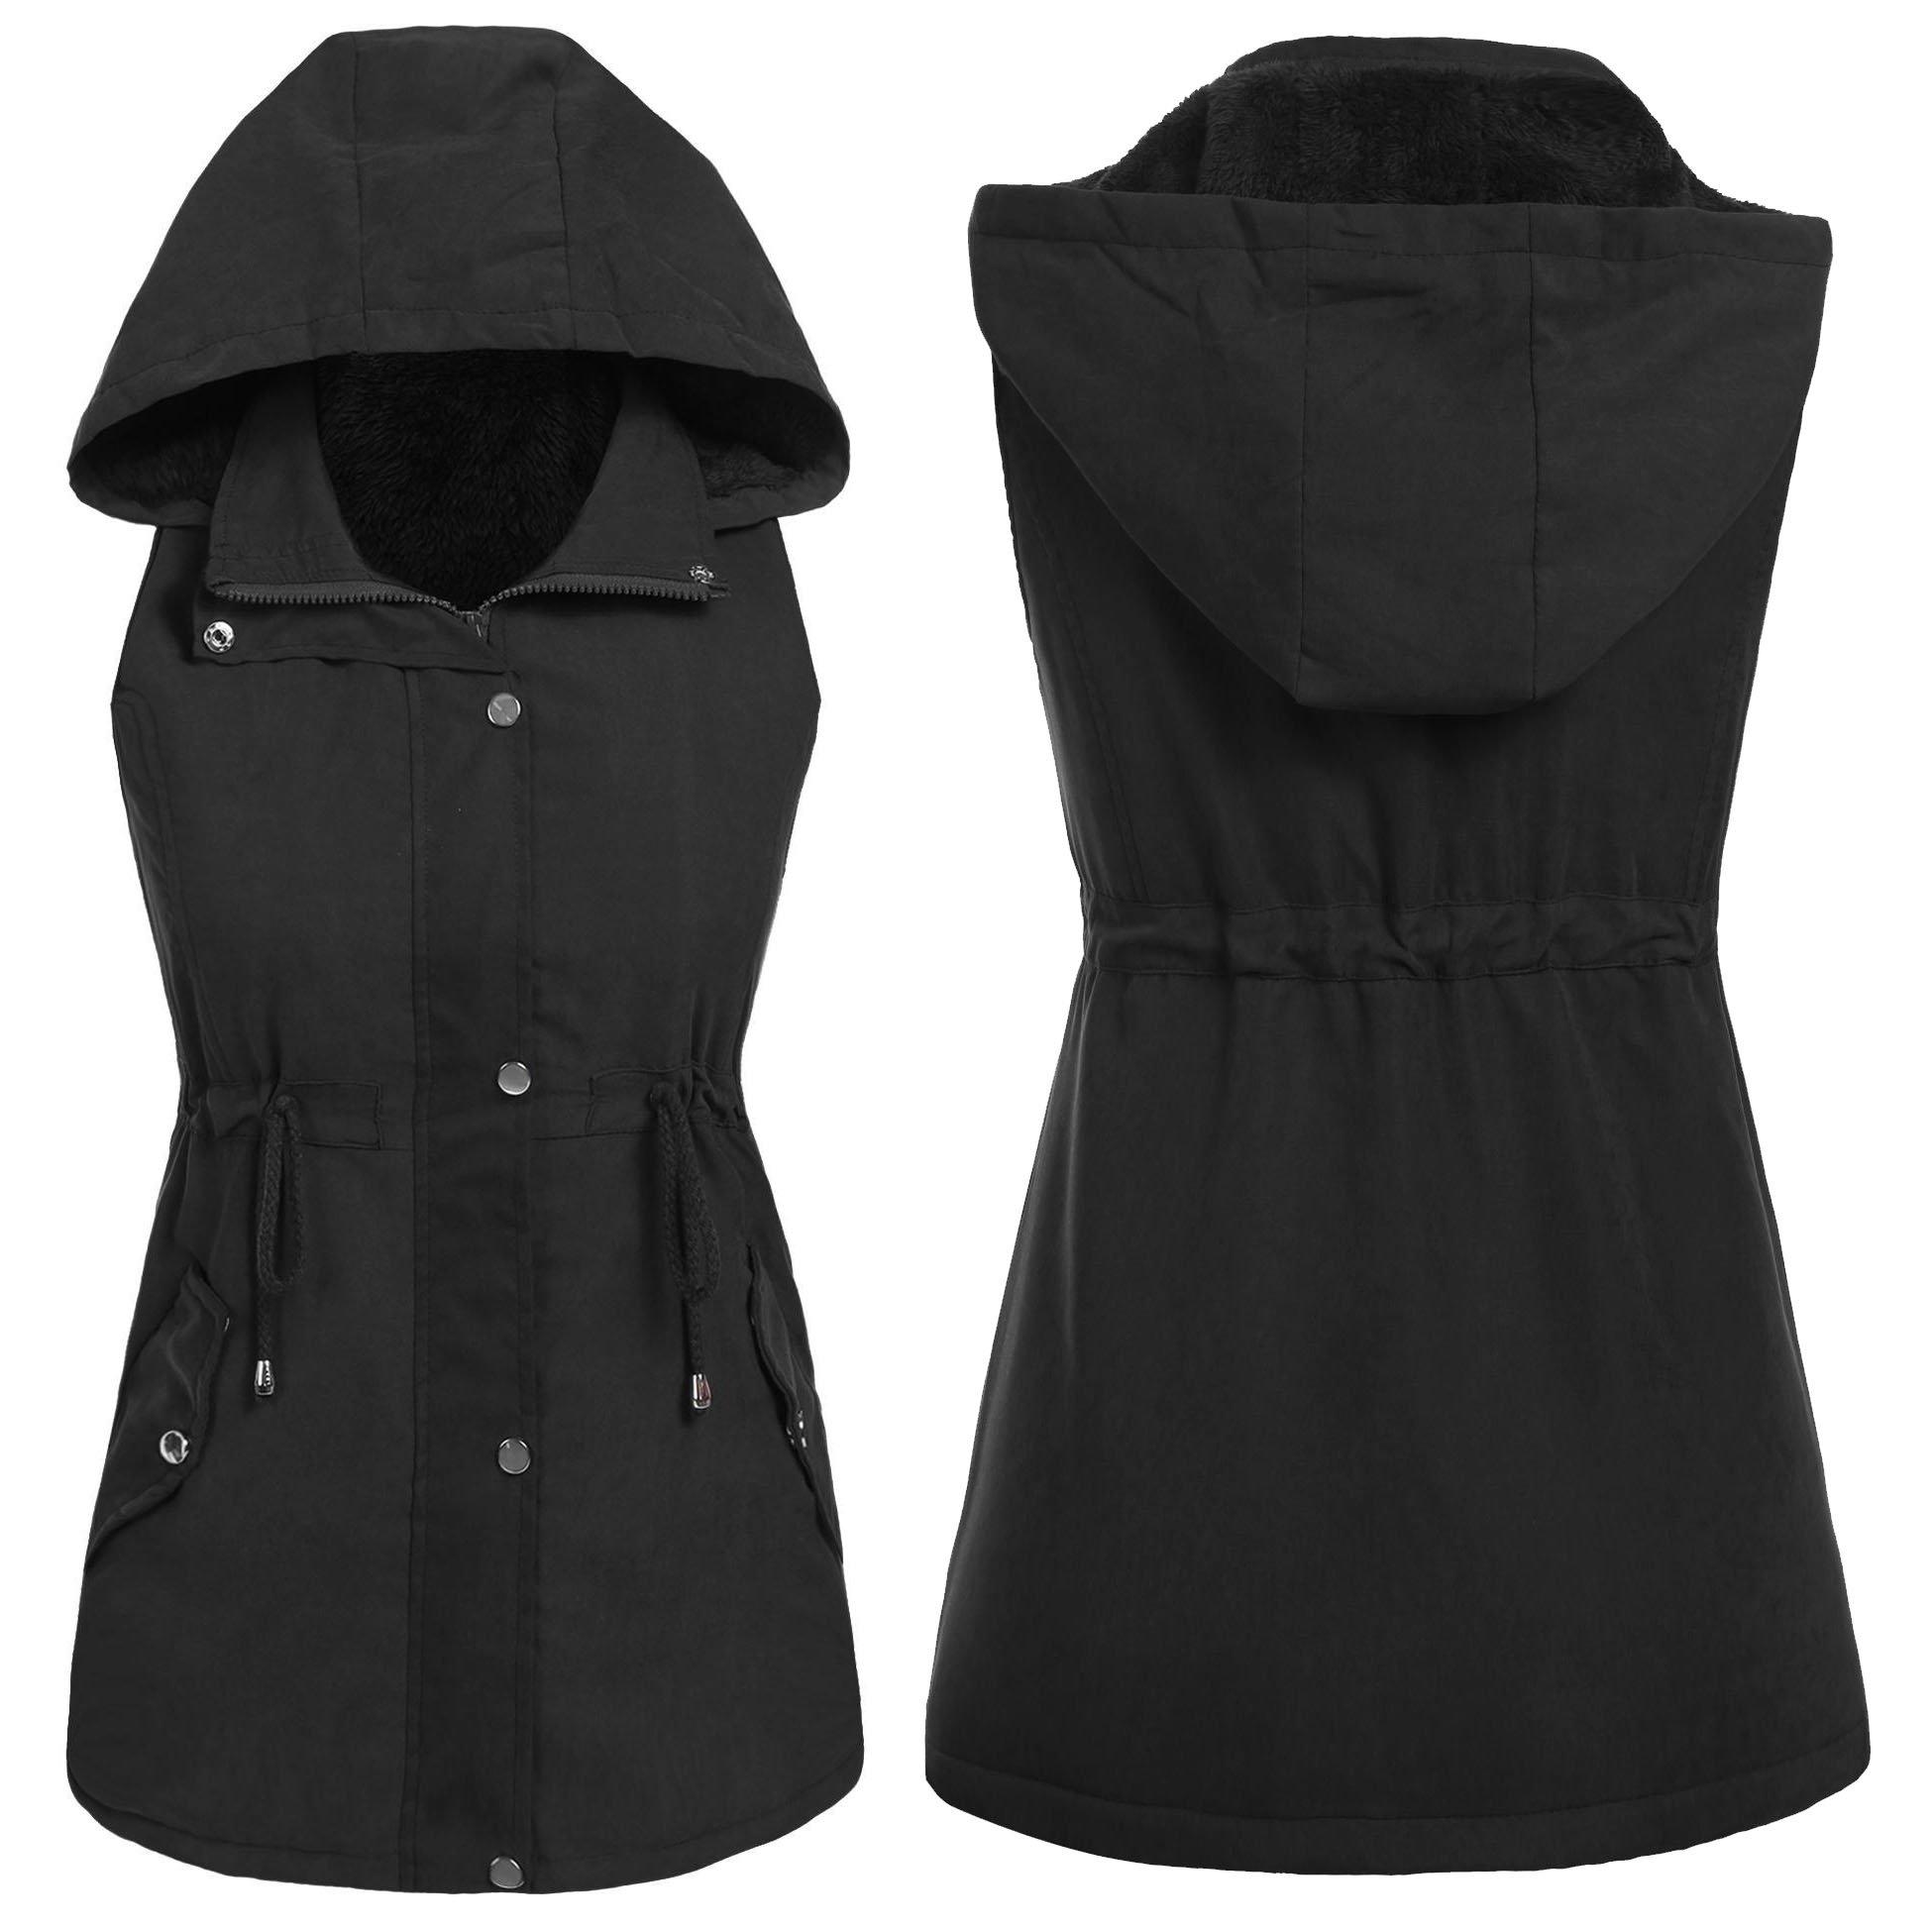 Dickin Women's Sleeveless Pockets Jacket Outdoors Travels Sports Vest Tops (Black XL)